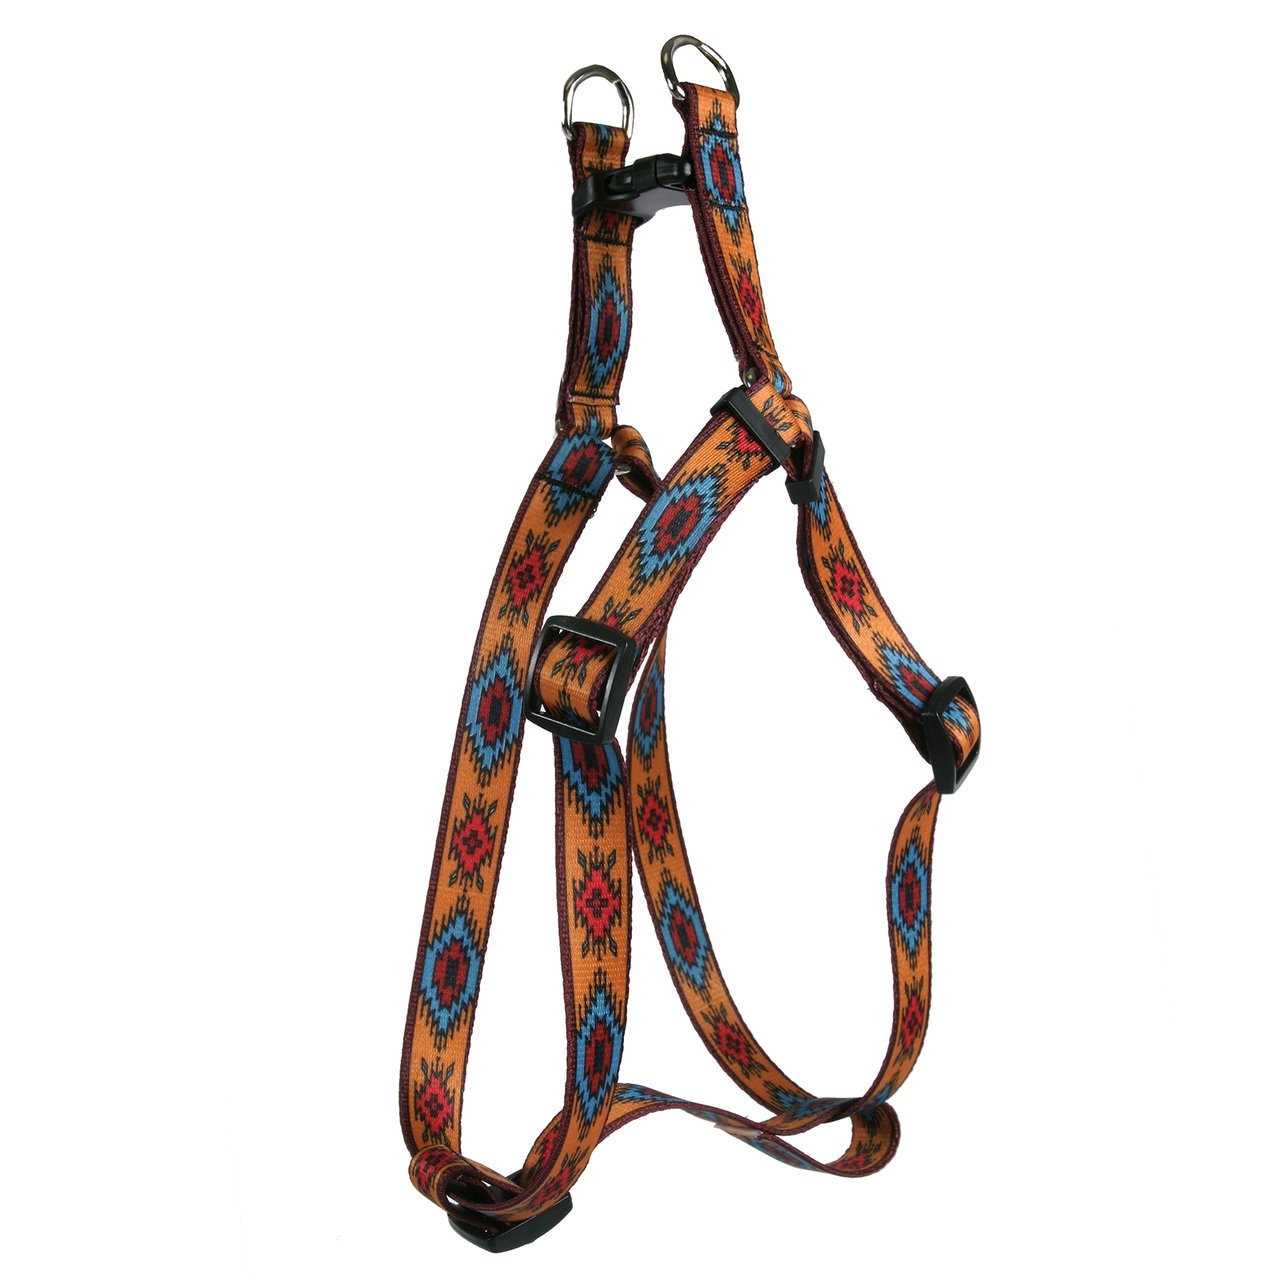 Yellow Dog Design Standard Step-In Harness, Indian Spirit Orange, Large 25'' - 40''